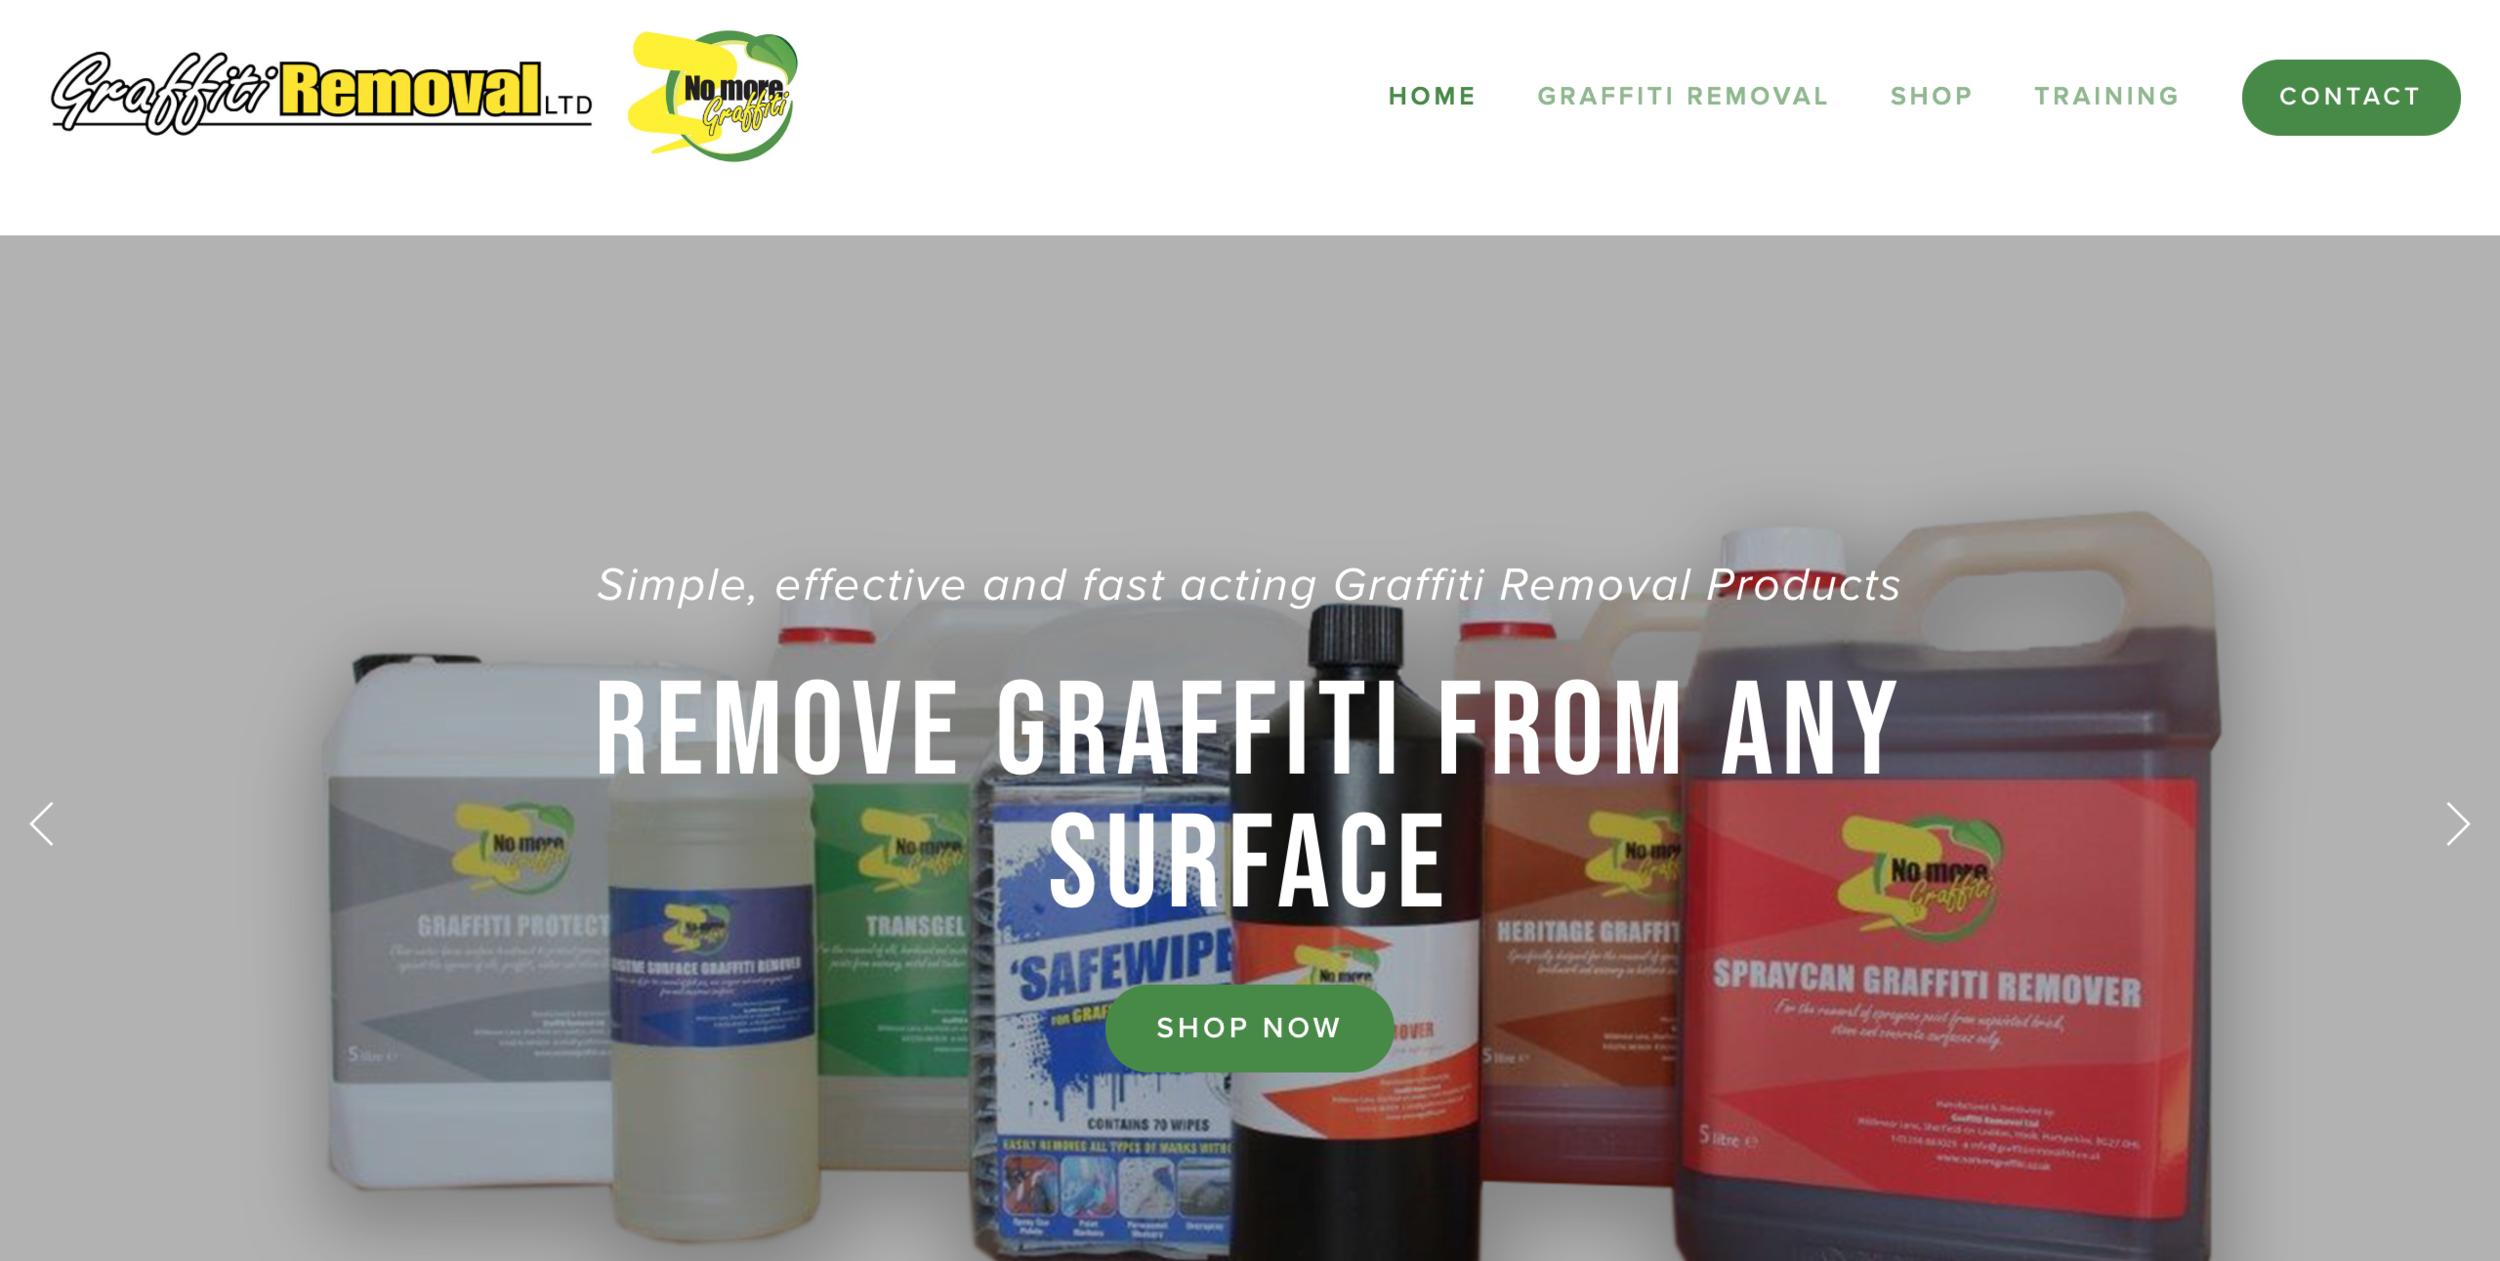 graffiti removal ltd website